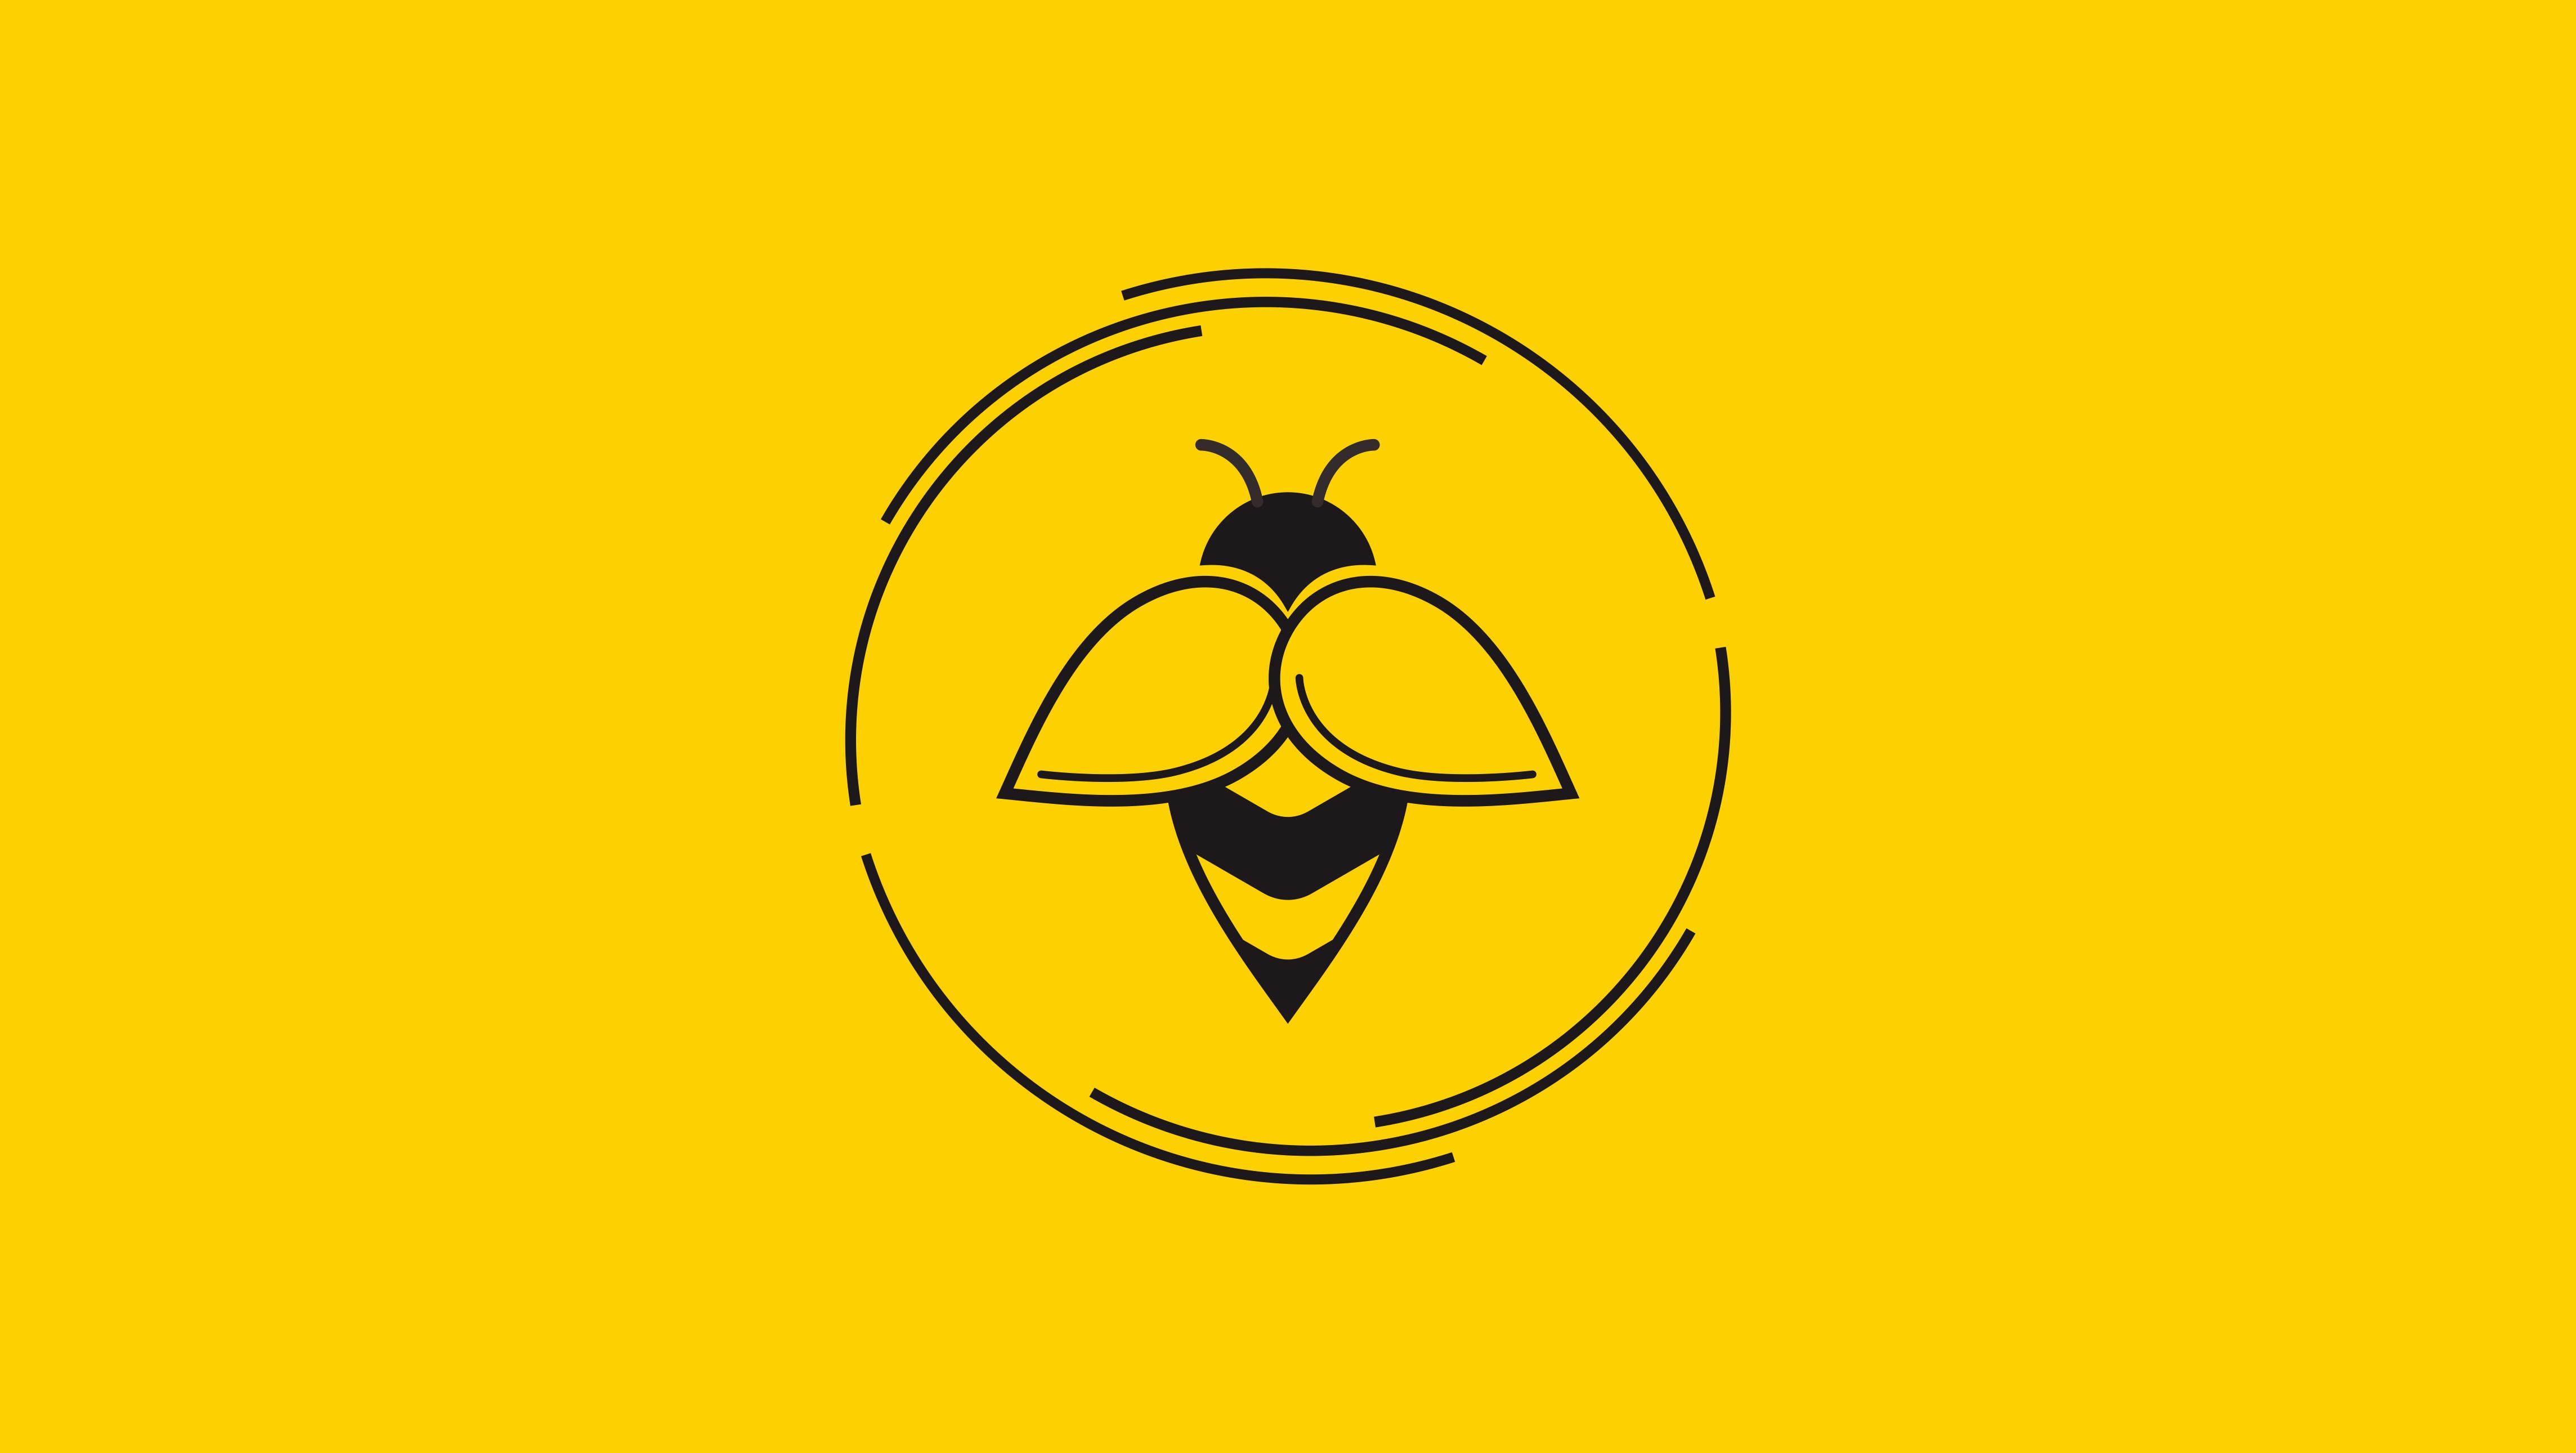 LOGO设计企业公司品牌平面设计注册图文图形标志商标logo